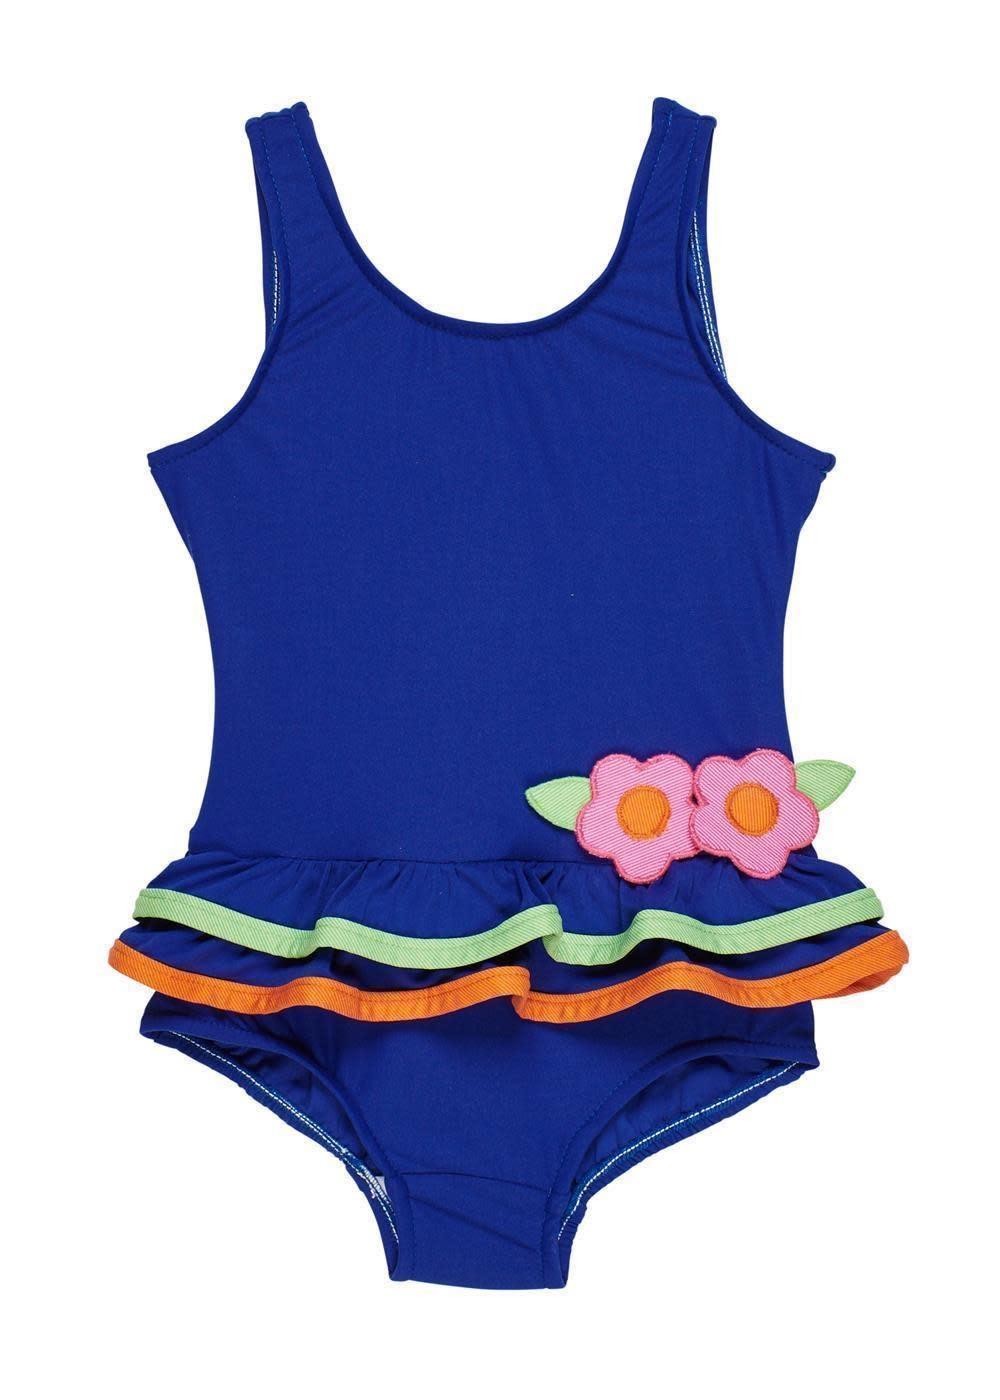 Florence Eiseman Bright Navy Tank Swimsuit